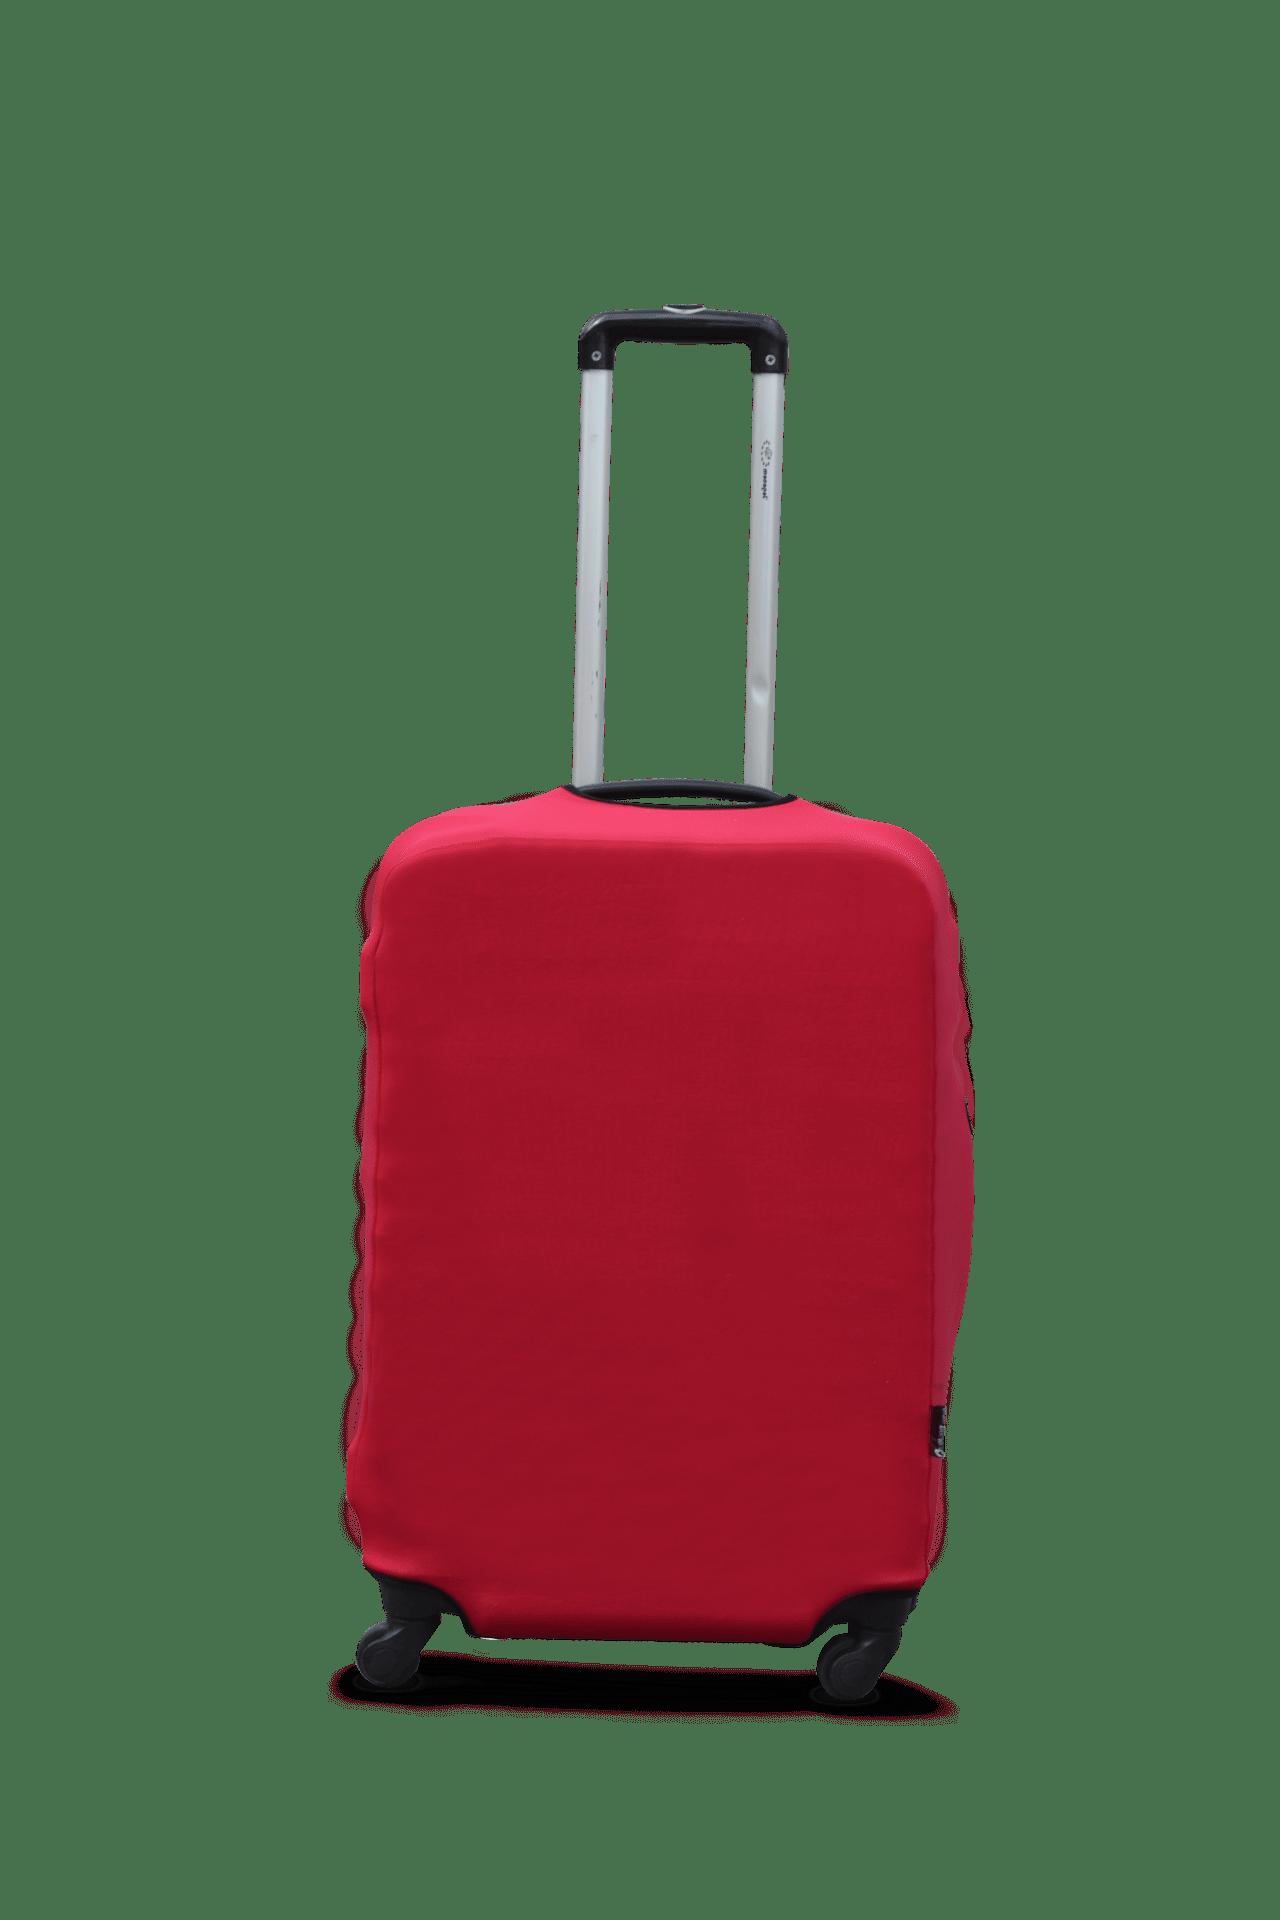 Husa pentru valiza daiving Cover DAWING M RED